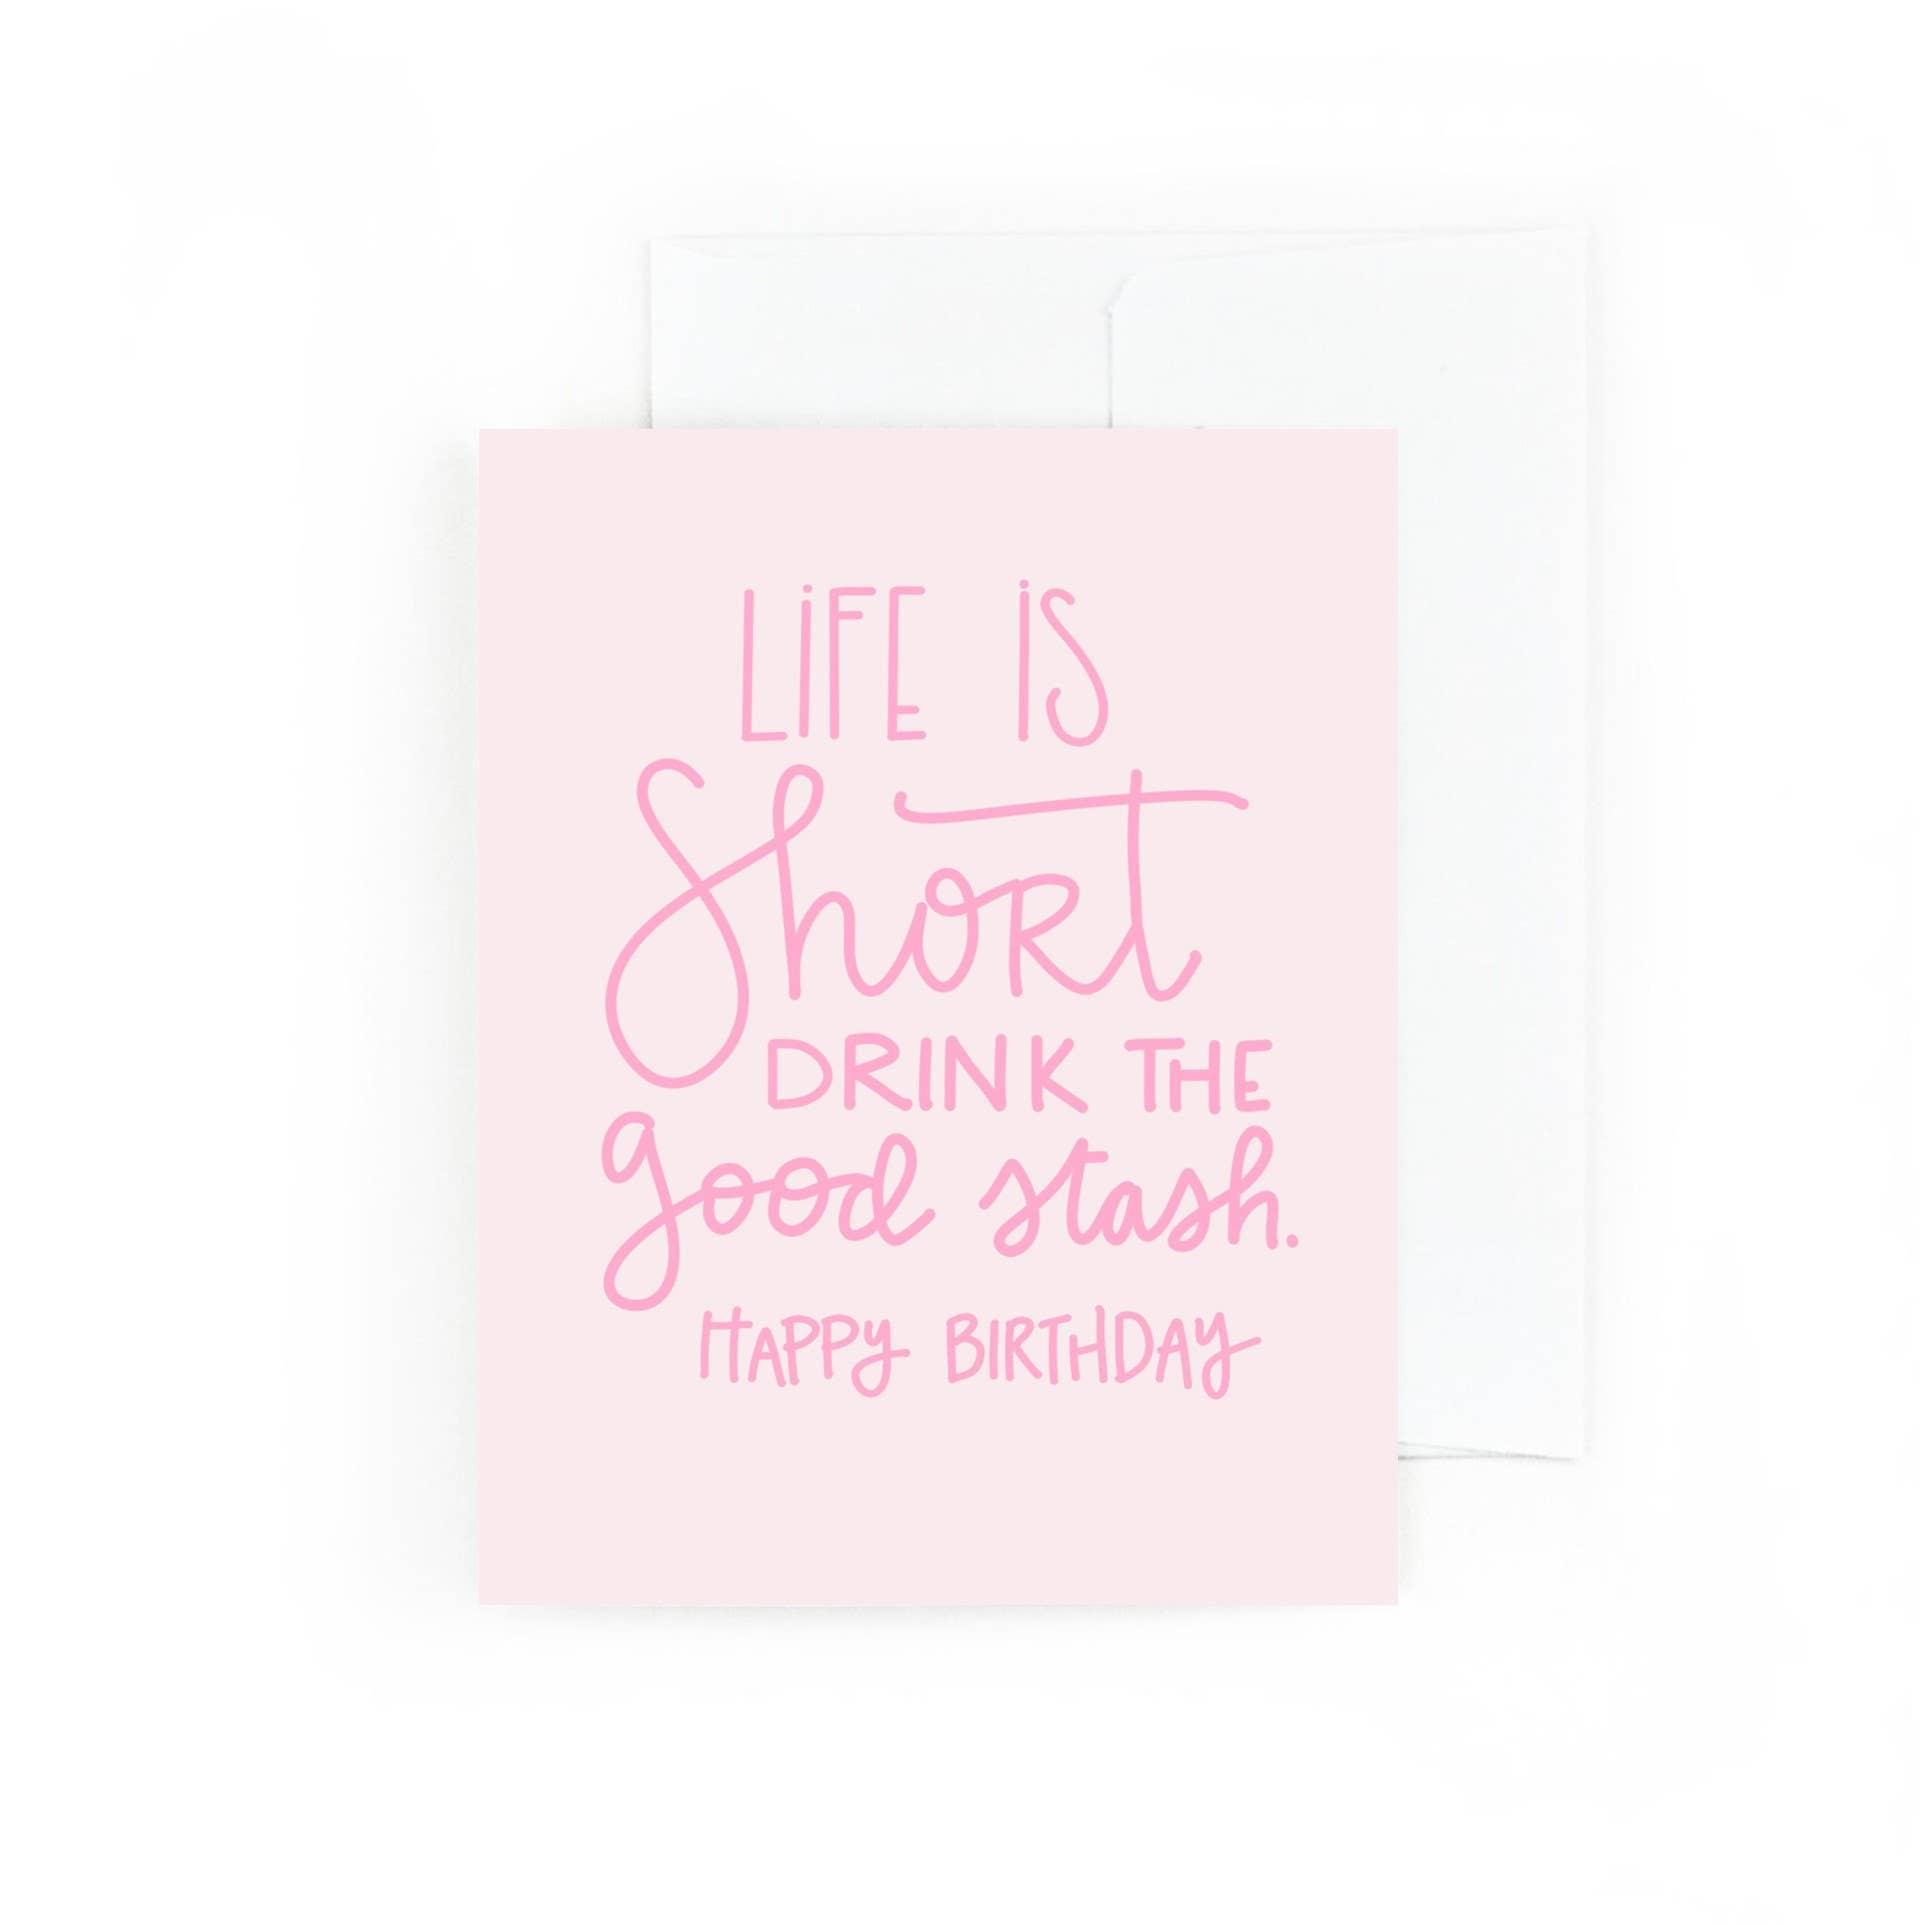 Life is Short, Drink the Good Stash Happy Birthday | Trada Marketplace